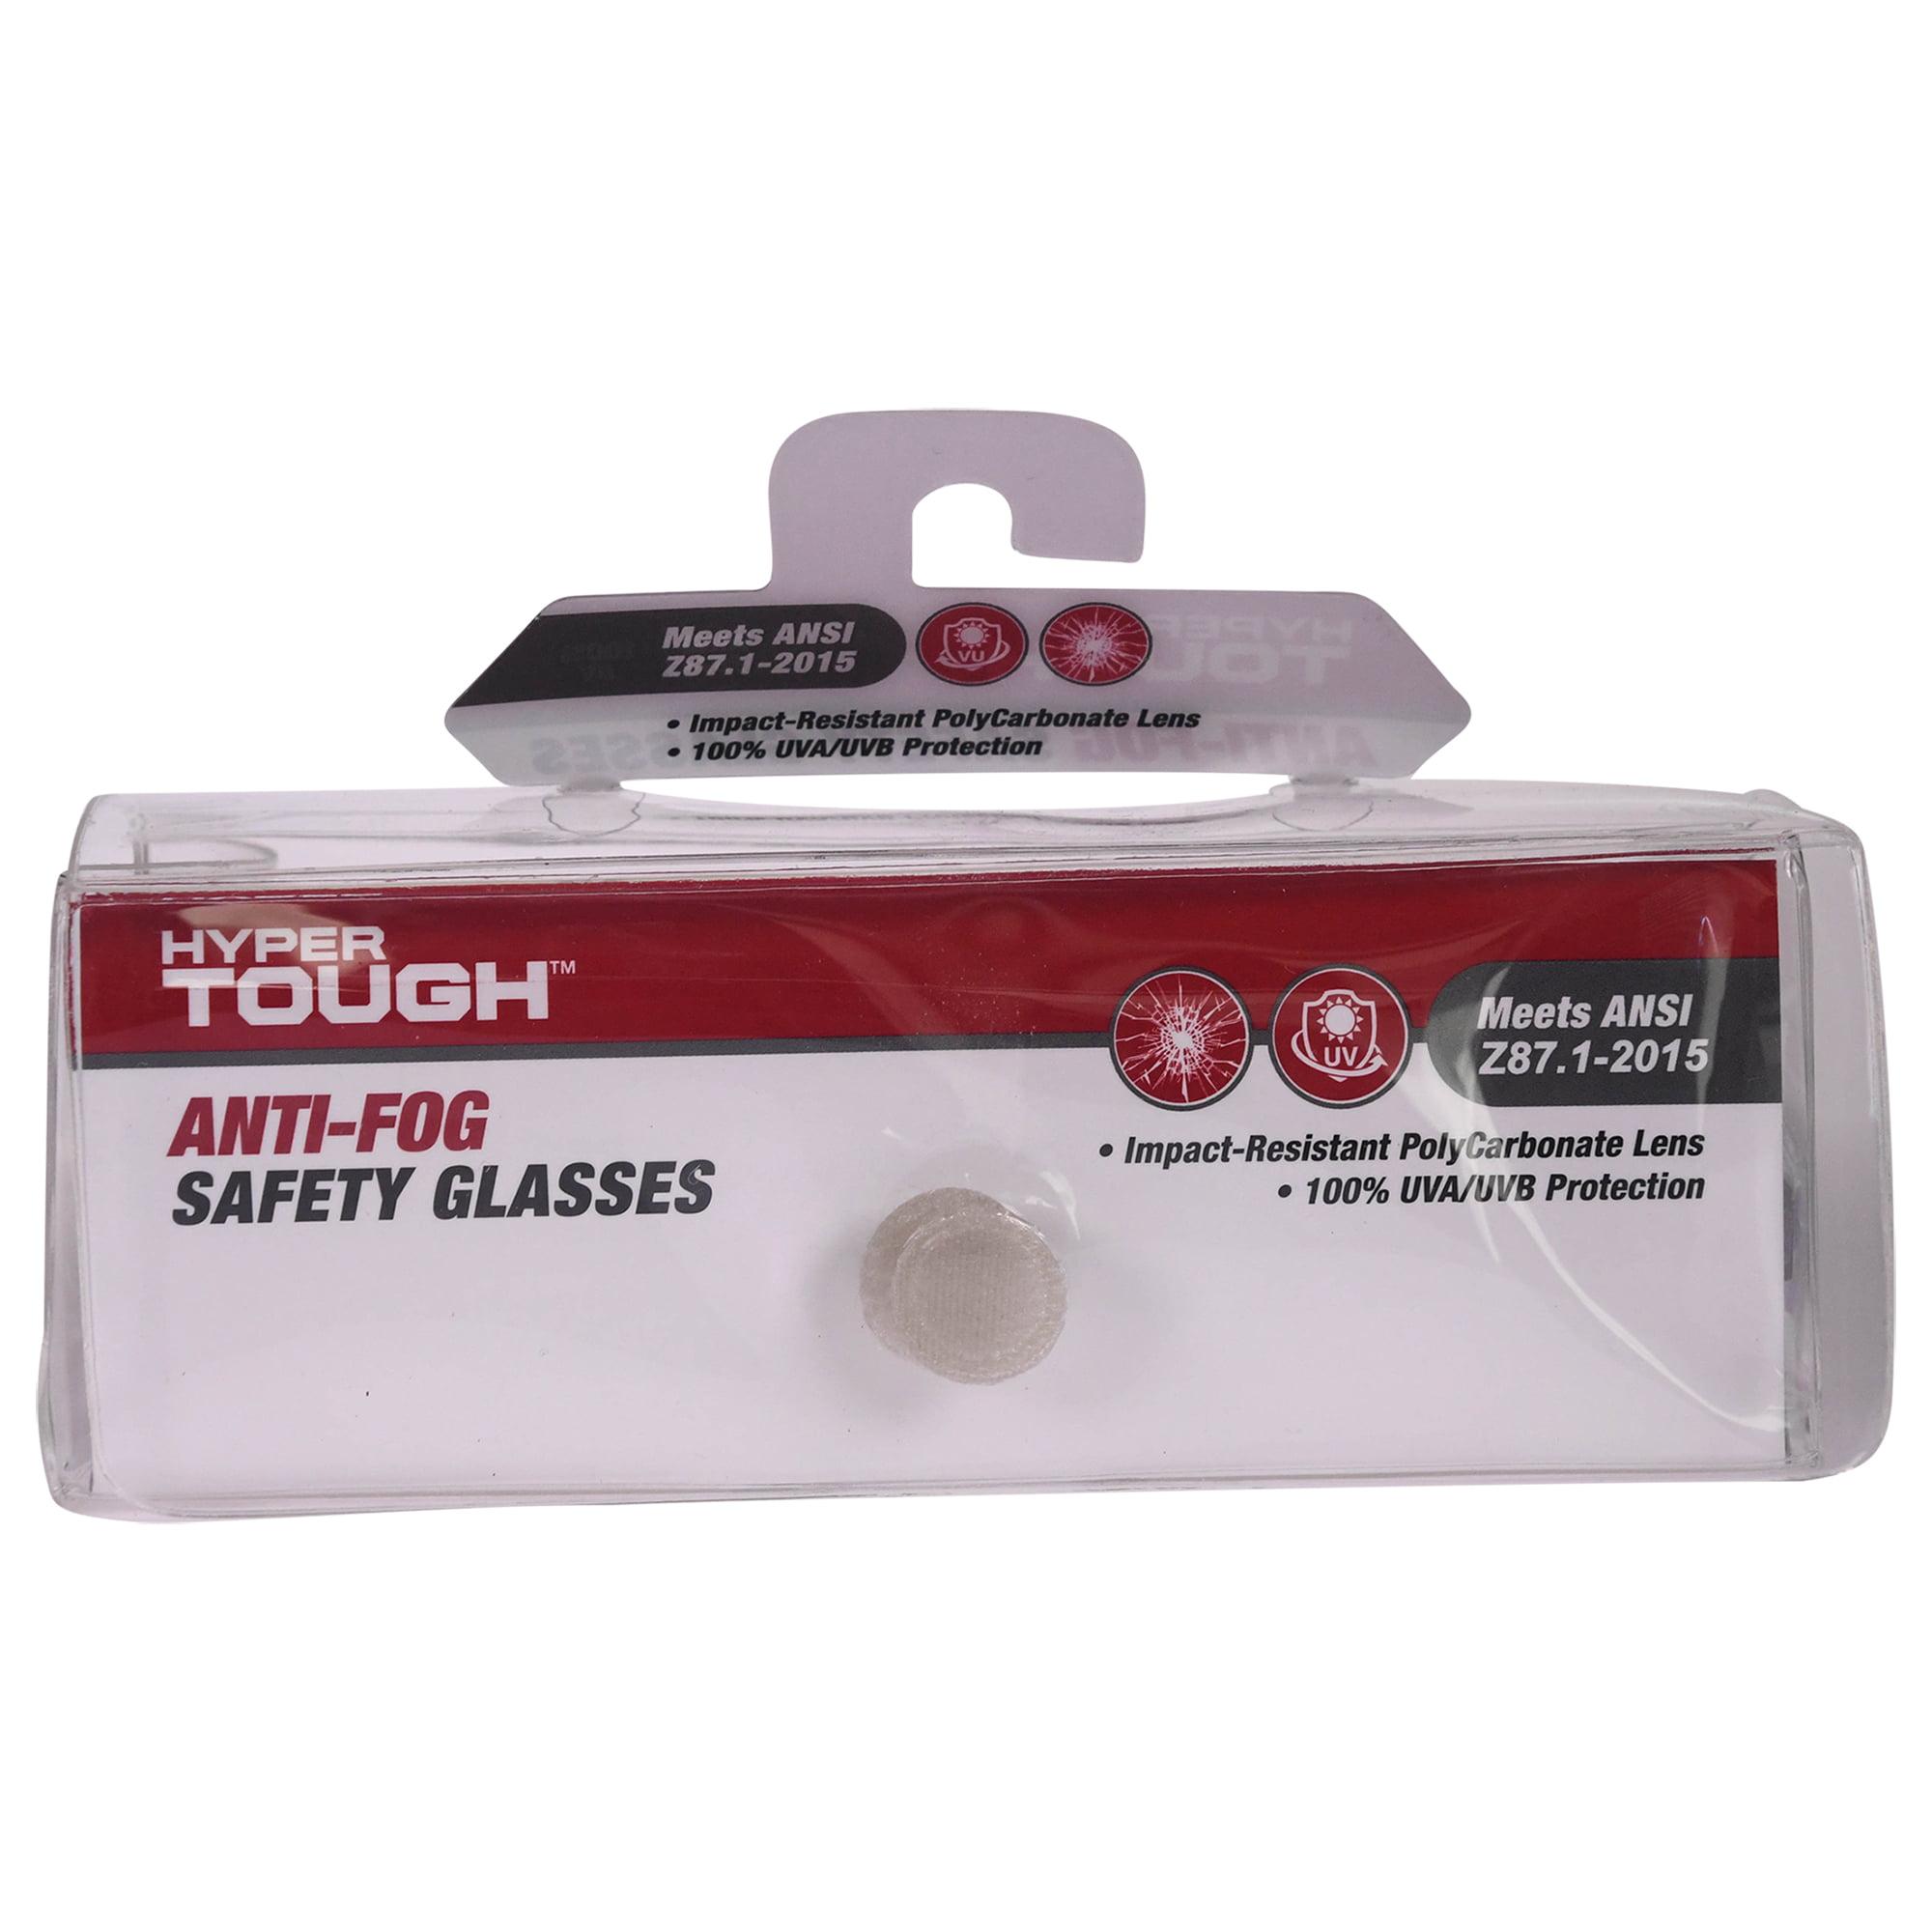 Hyper Tough Safety Glasses